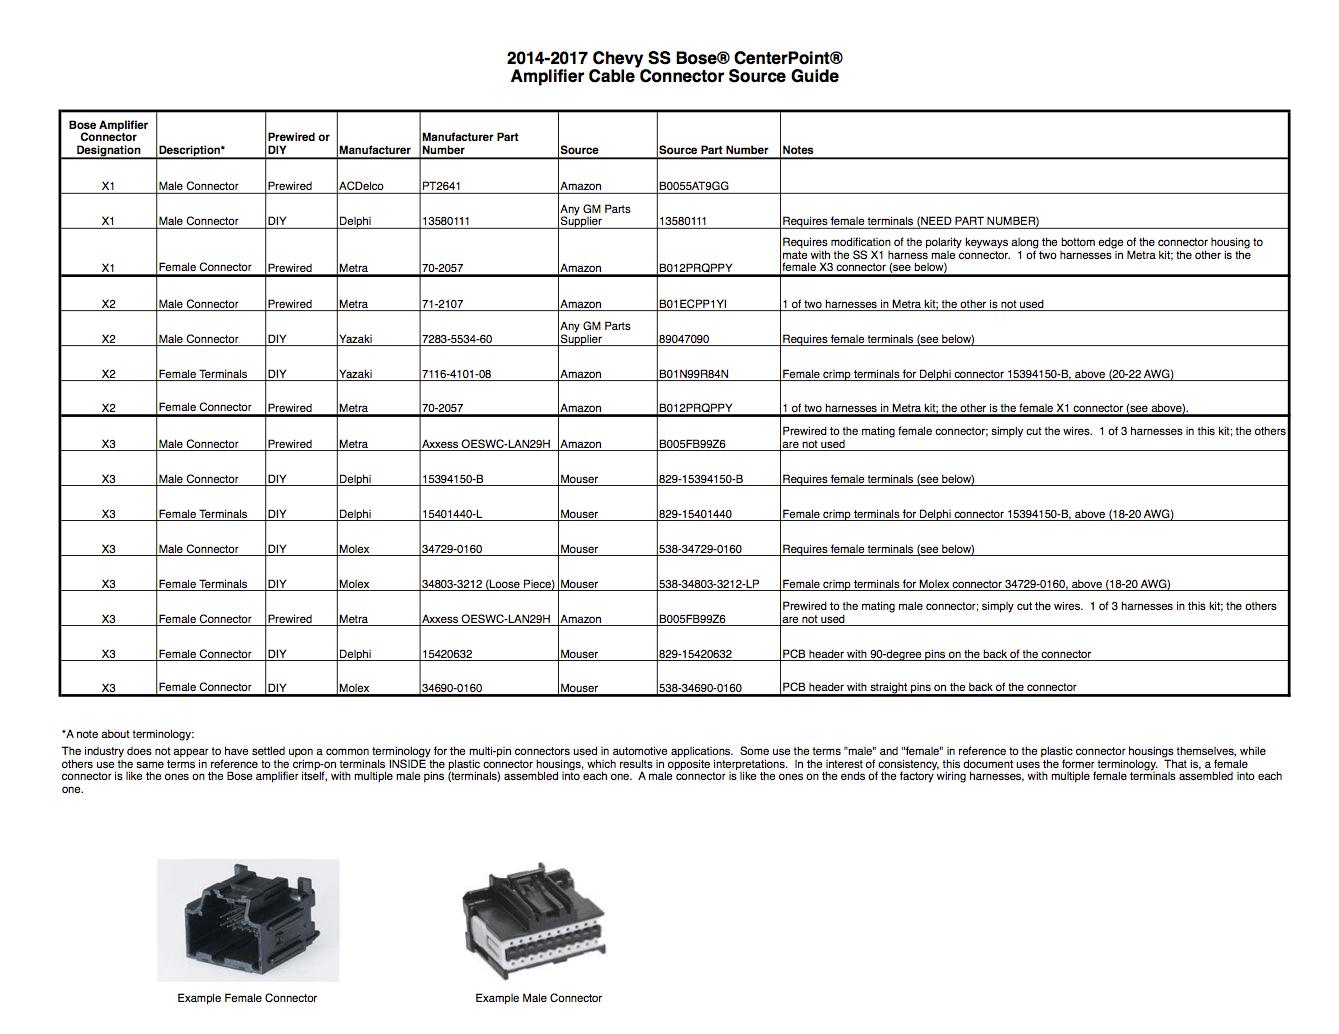 bose amp wiring diagram manual 2005 dodge stratus engine 5600 28 images